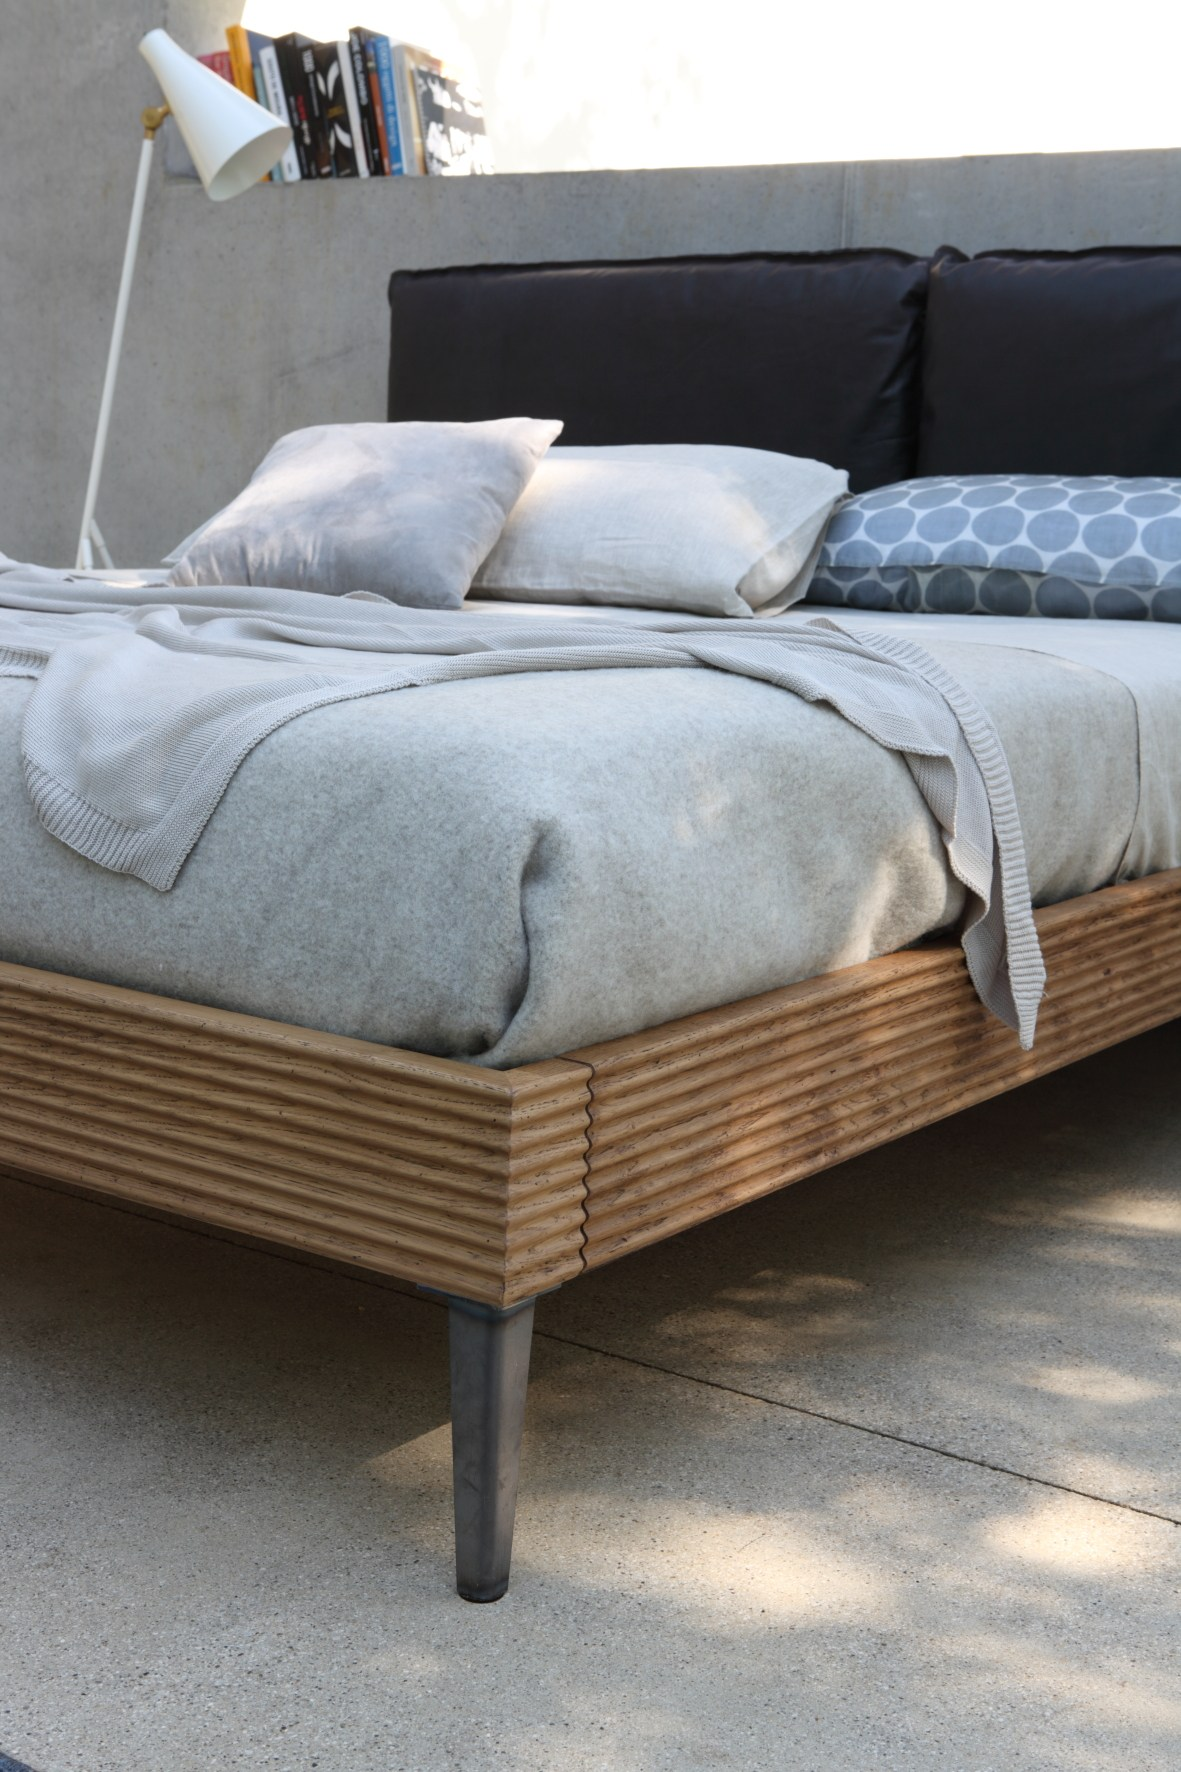 bett mit polsterkopfteil by devina nais. Black Bedroom Furniture Sets. Home Design Ideas